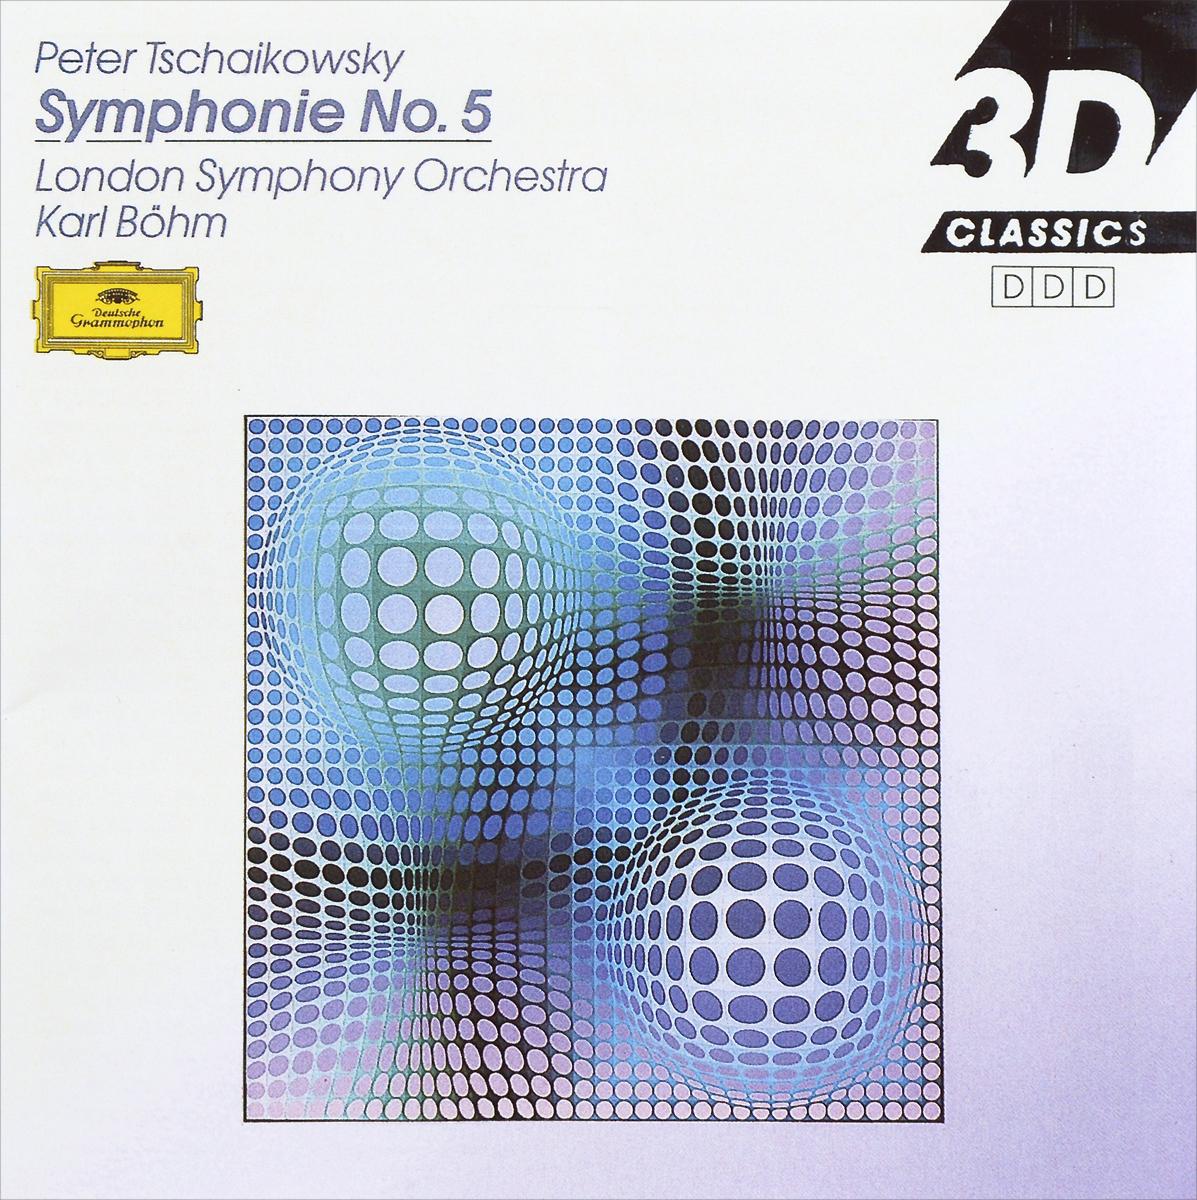 Карл Боэм,The London Symphony Orchestra Karl Boehm. Peter Tchaikovsky. Symphonie No. 5 карл боэм karl boehm mozart the abduction from the serail 2 cd